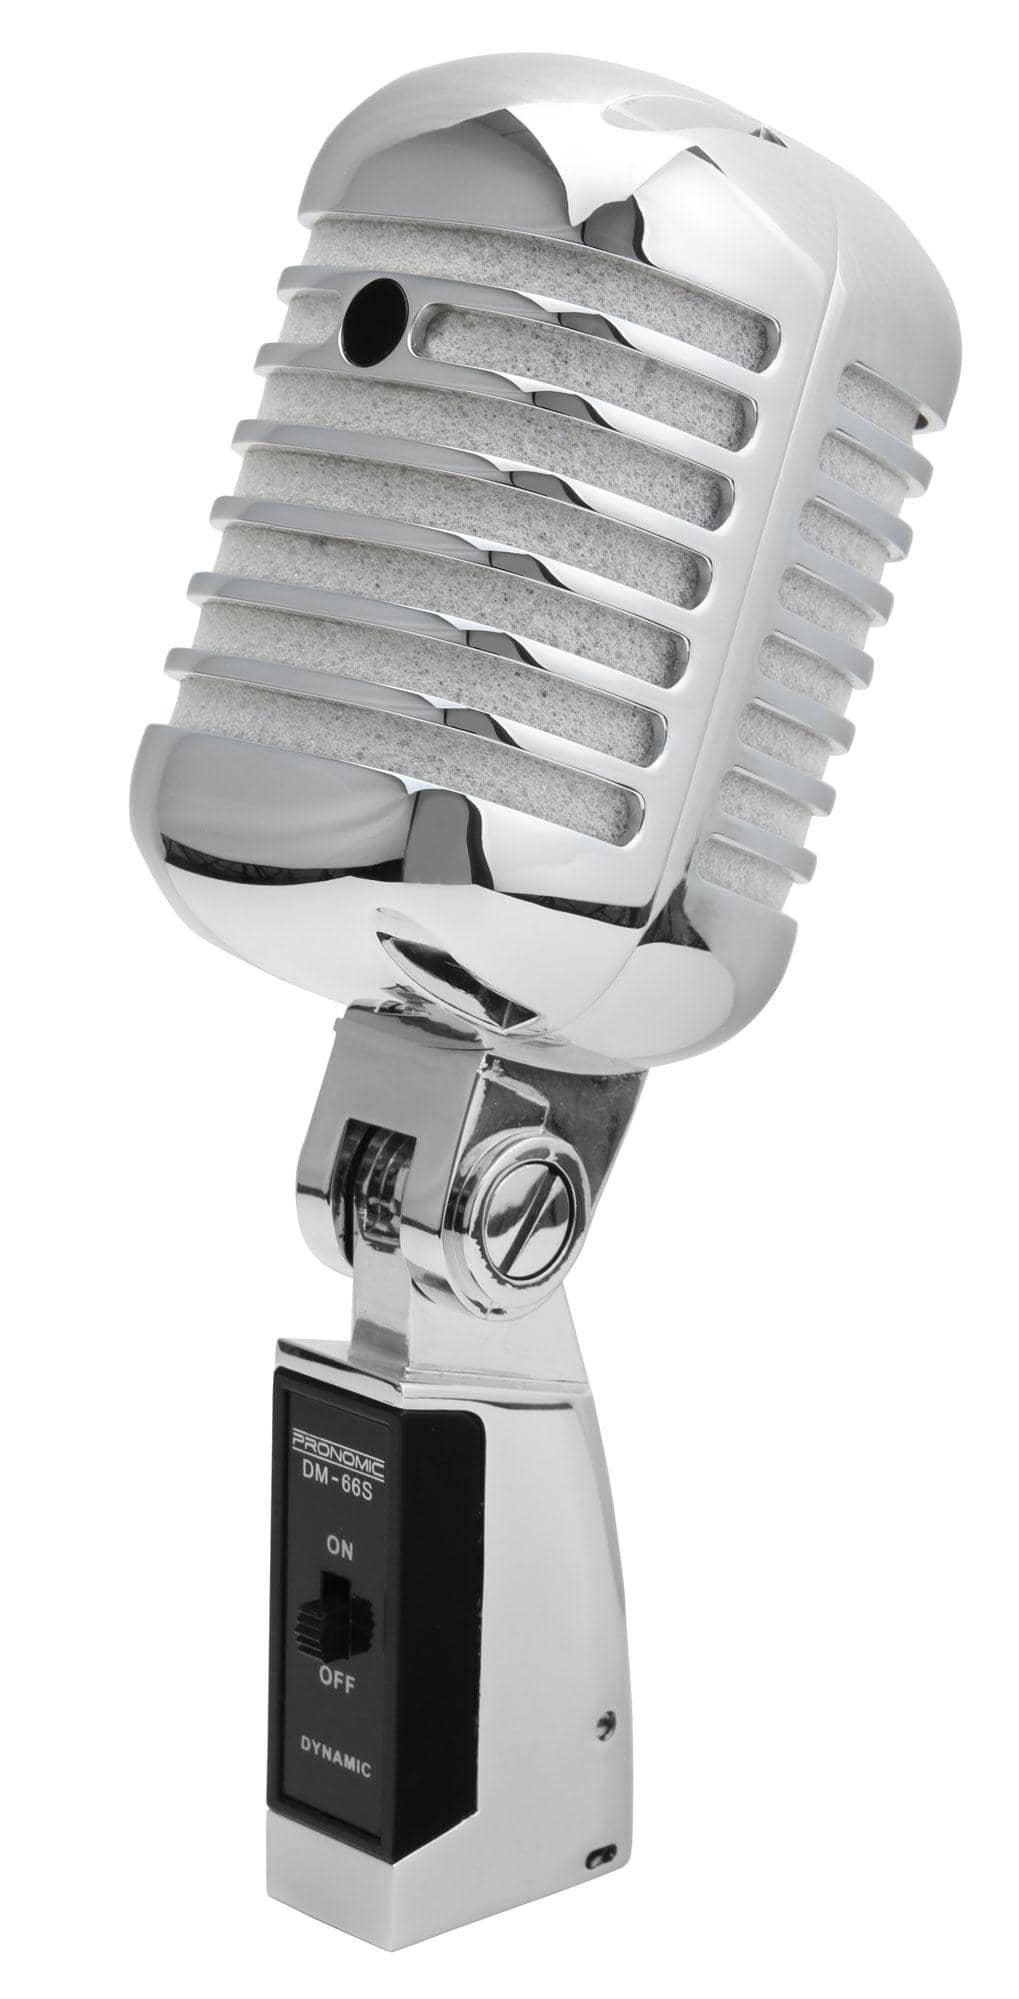 pronomic dm 66s dynamic elvis microphone silver set. Black Bedroom Furniture Sets. Home Design Ideas